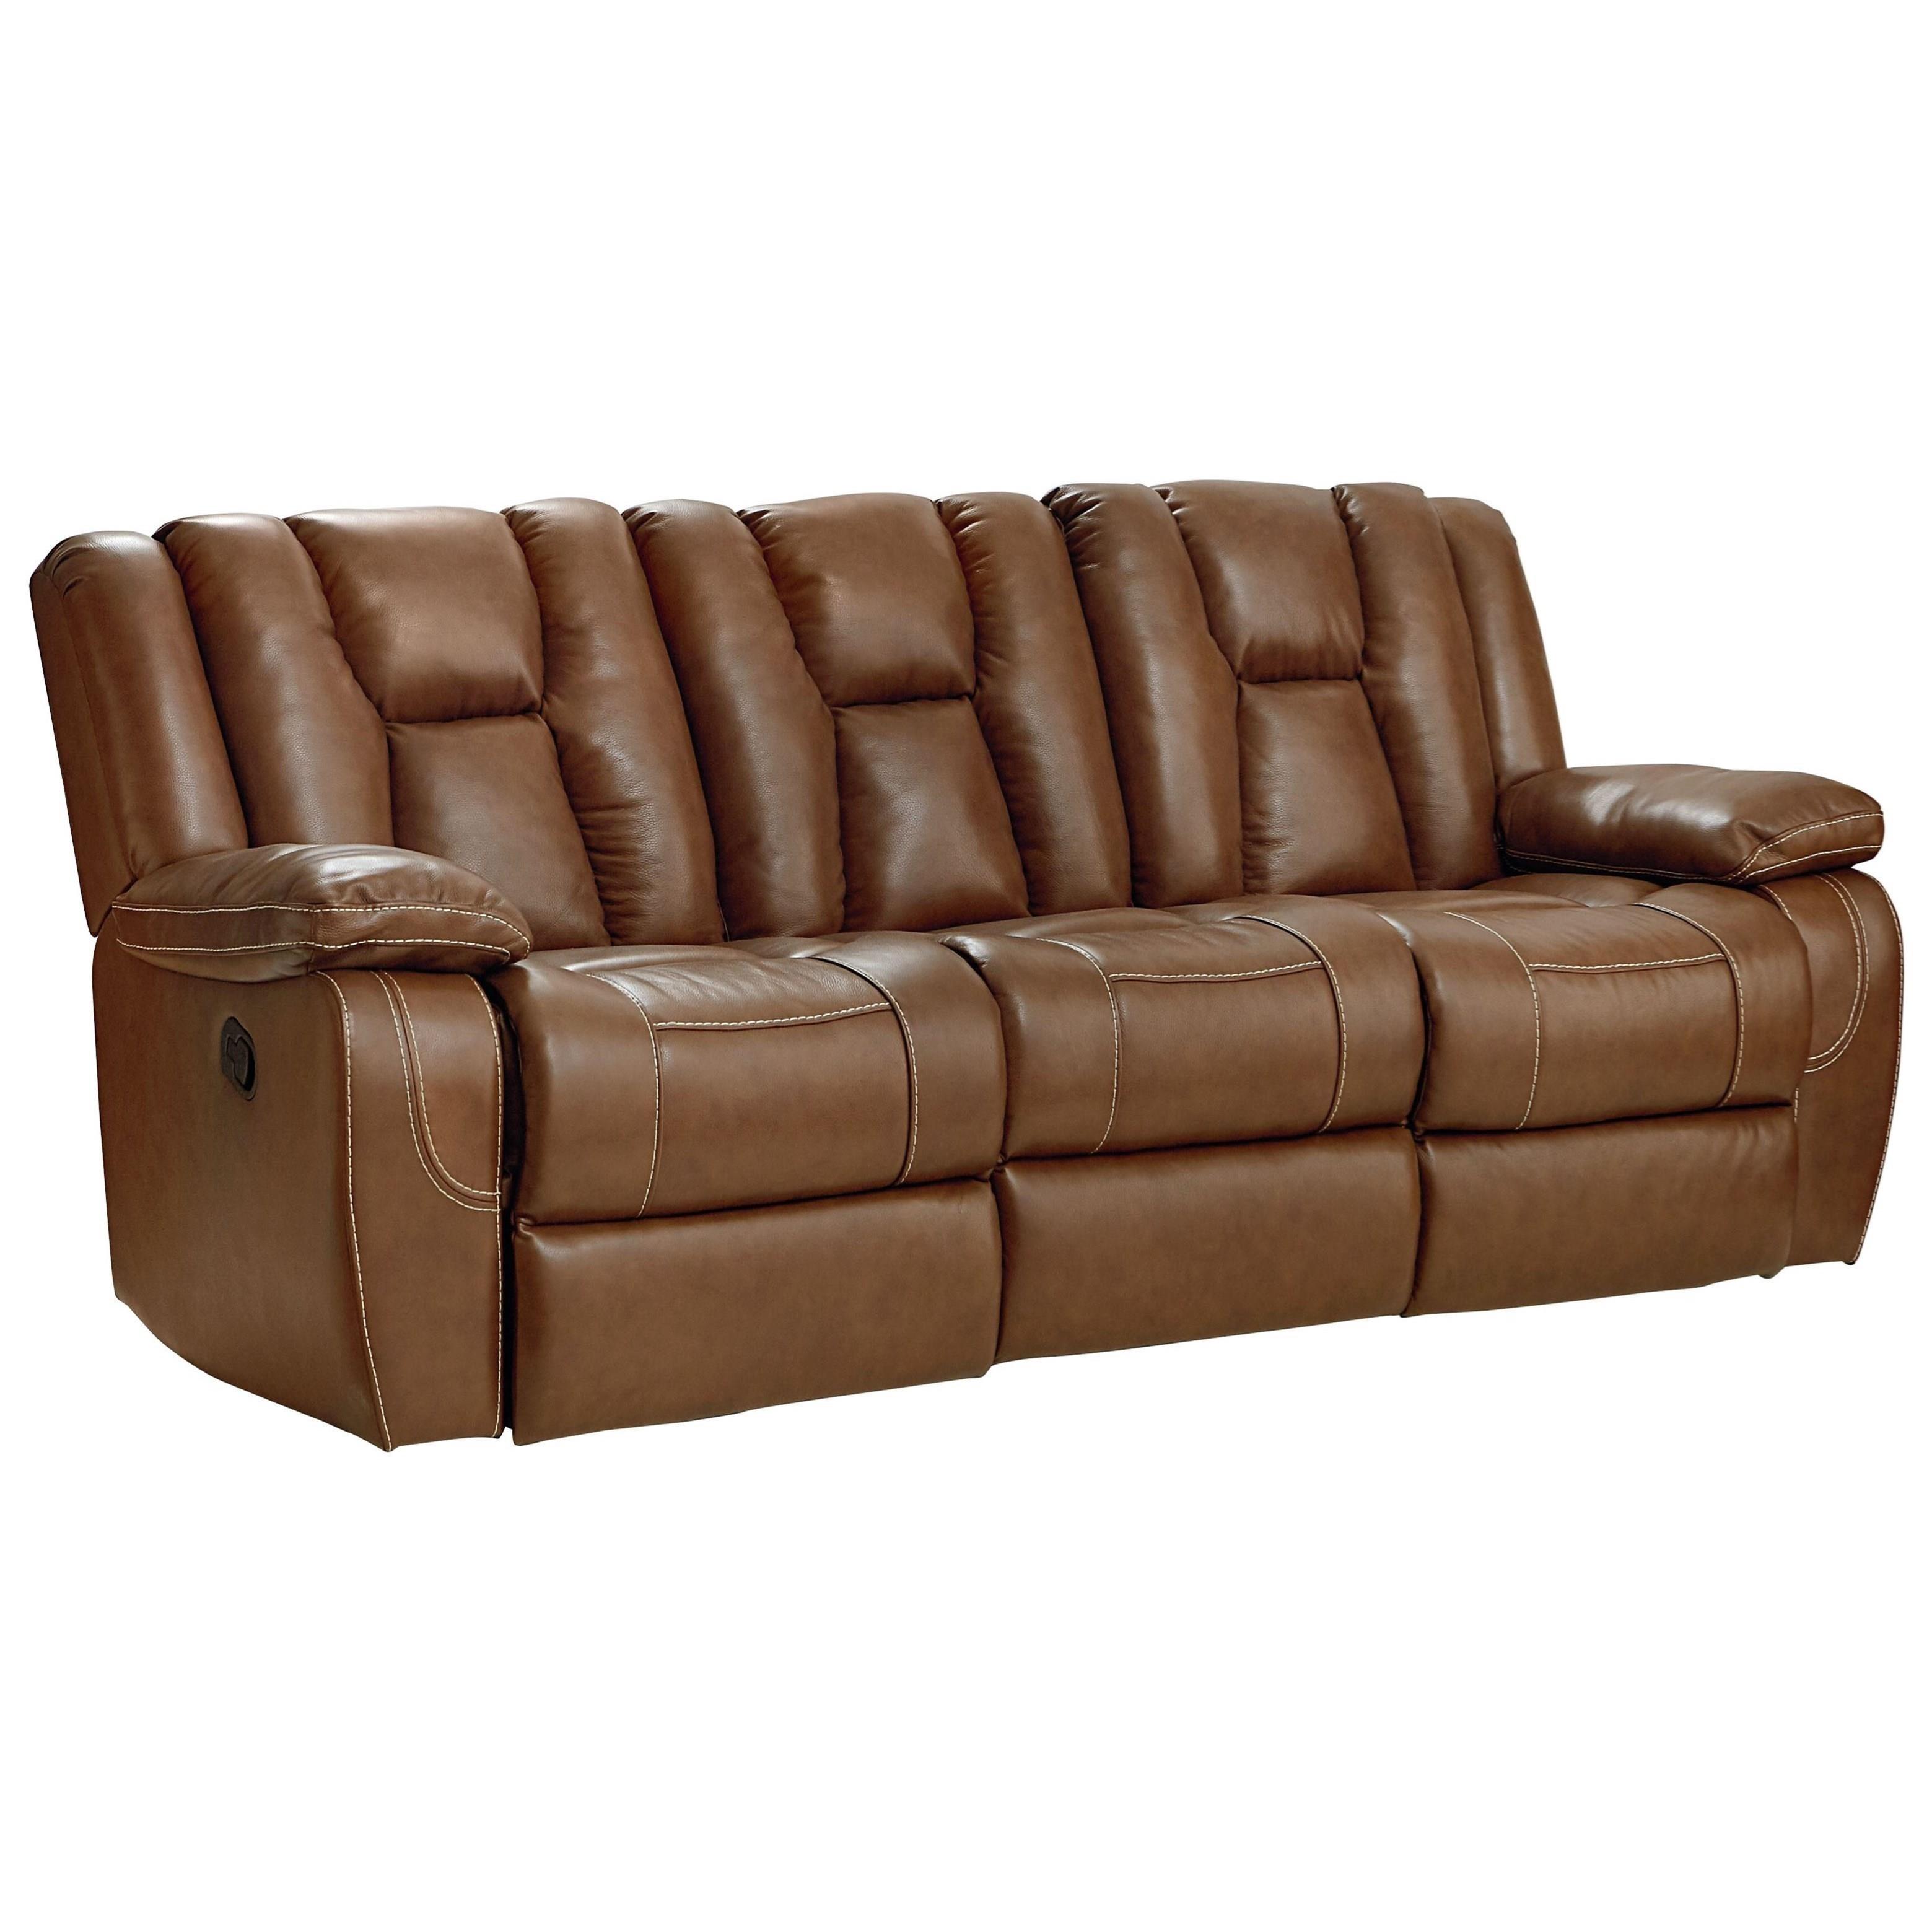 Standard Furniture Rainier Motion Sofa - Item Number: 4097392